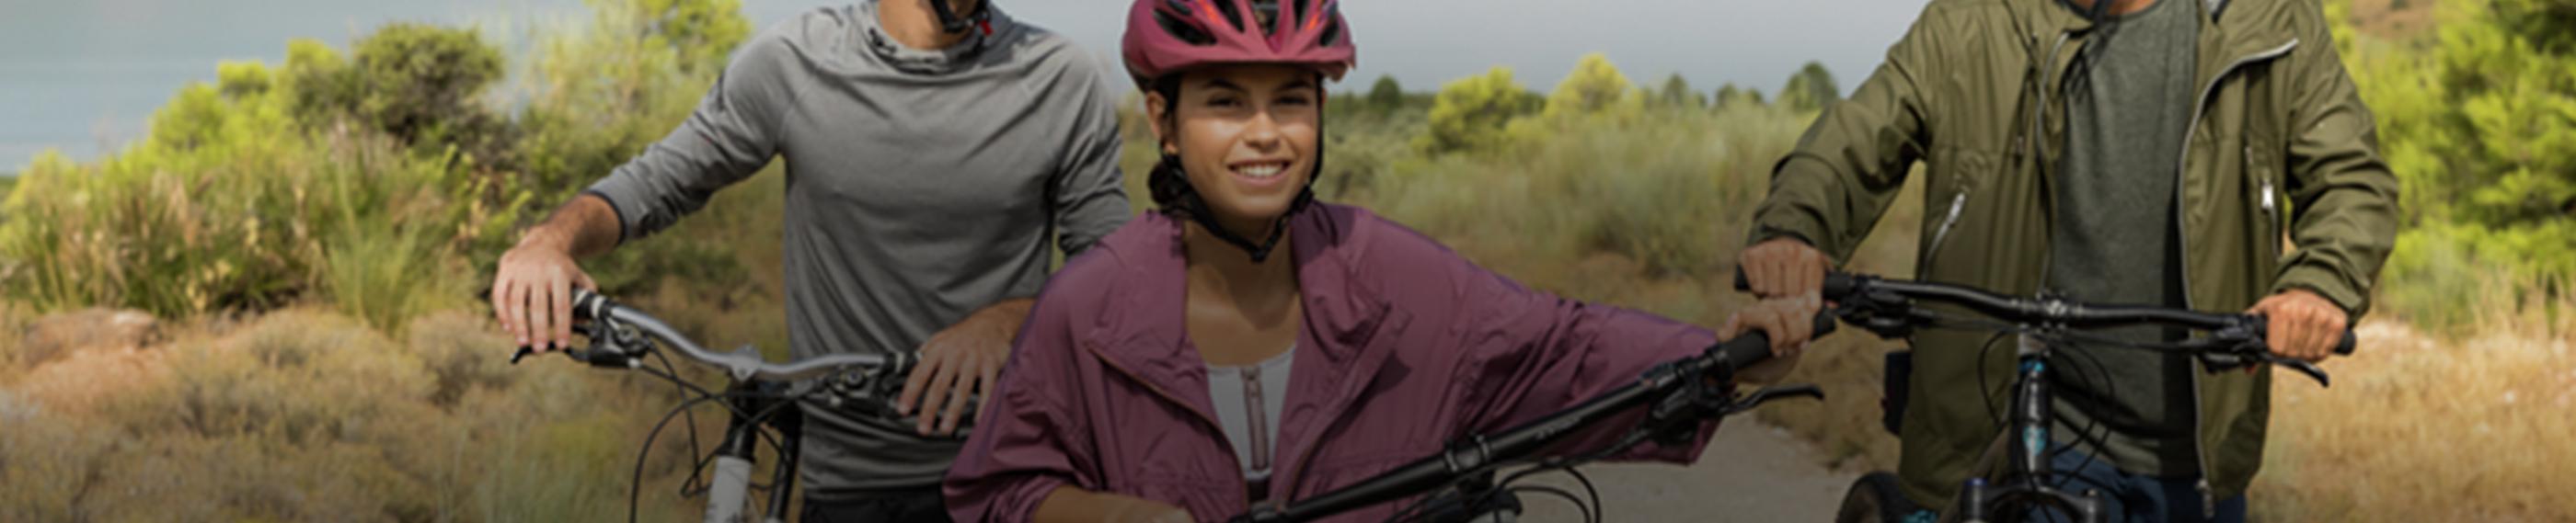 Ungdomar som cyklar utomhus.